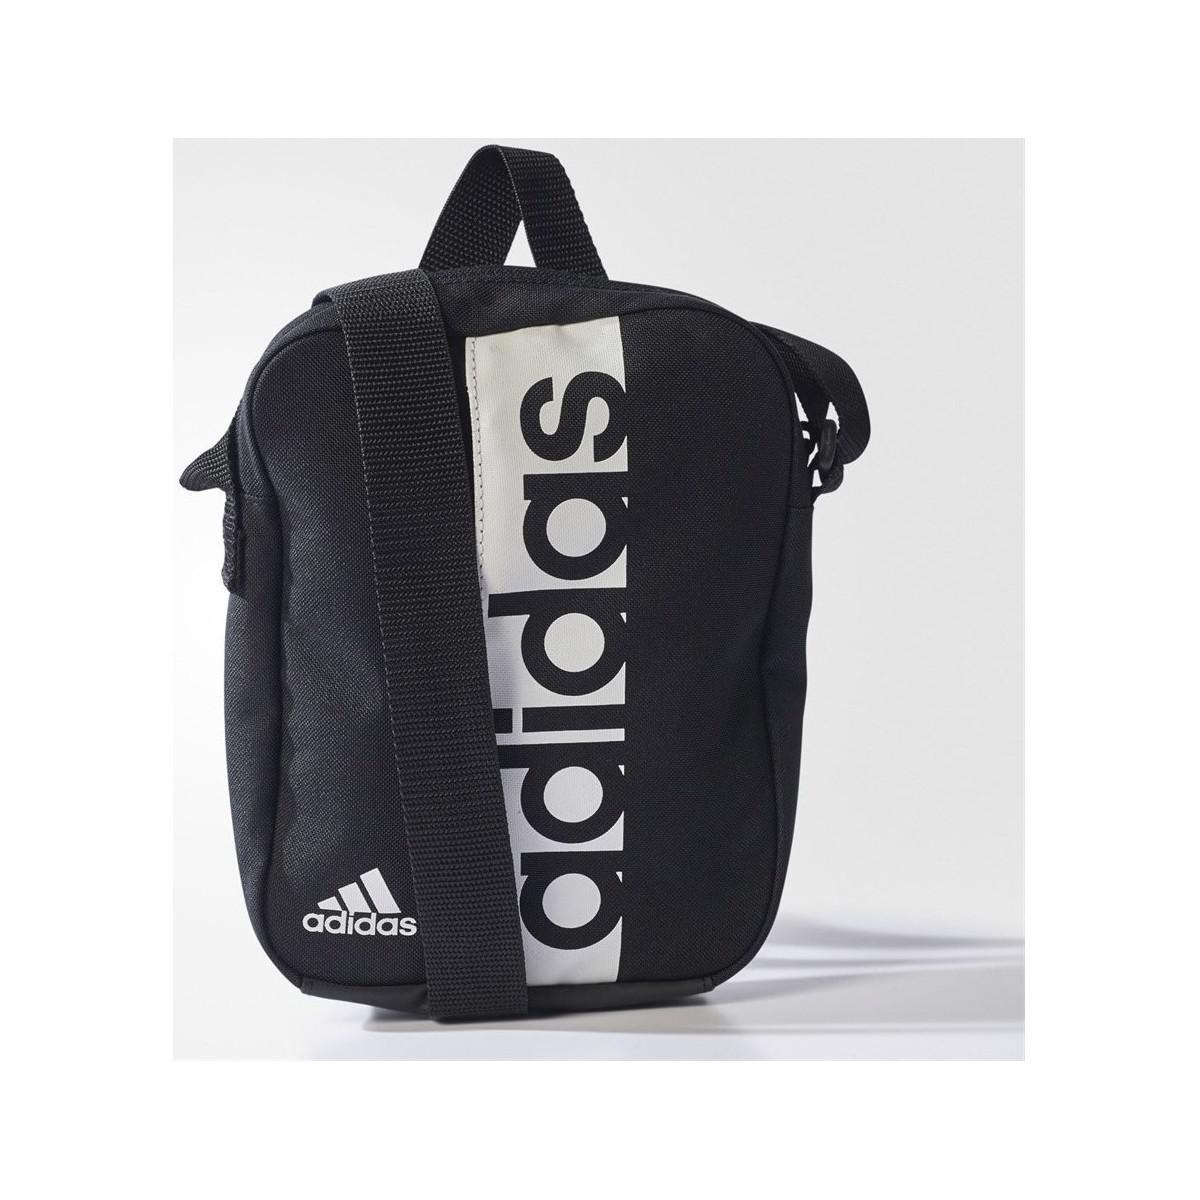 buy online a2460 ed065 adidas Linear Performance Women s Shoulder Bag In Black in Black for ...